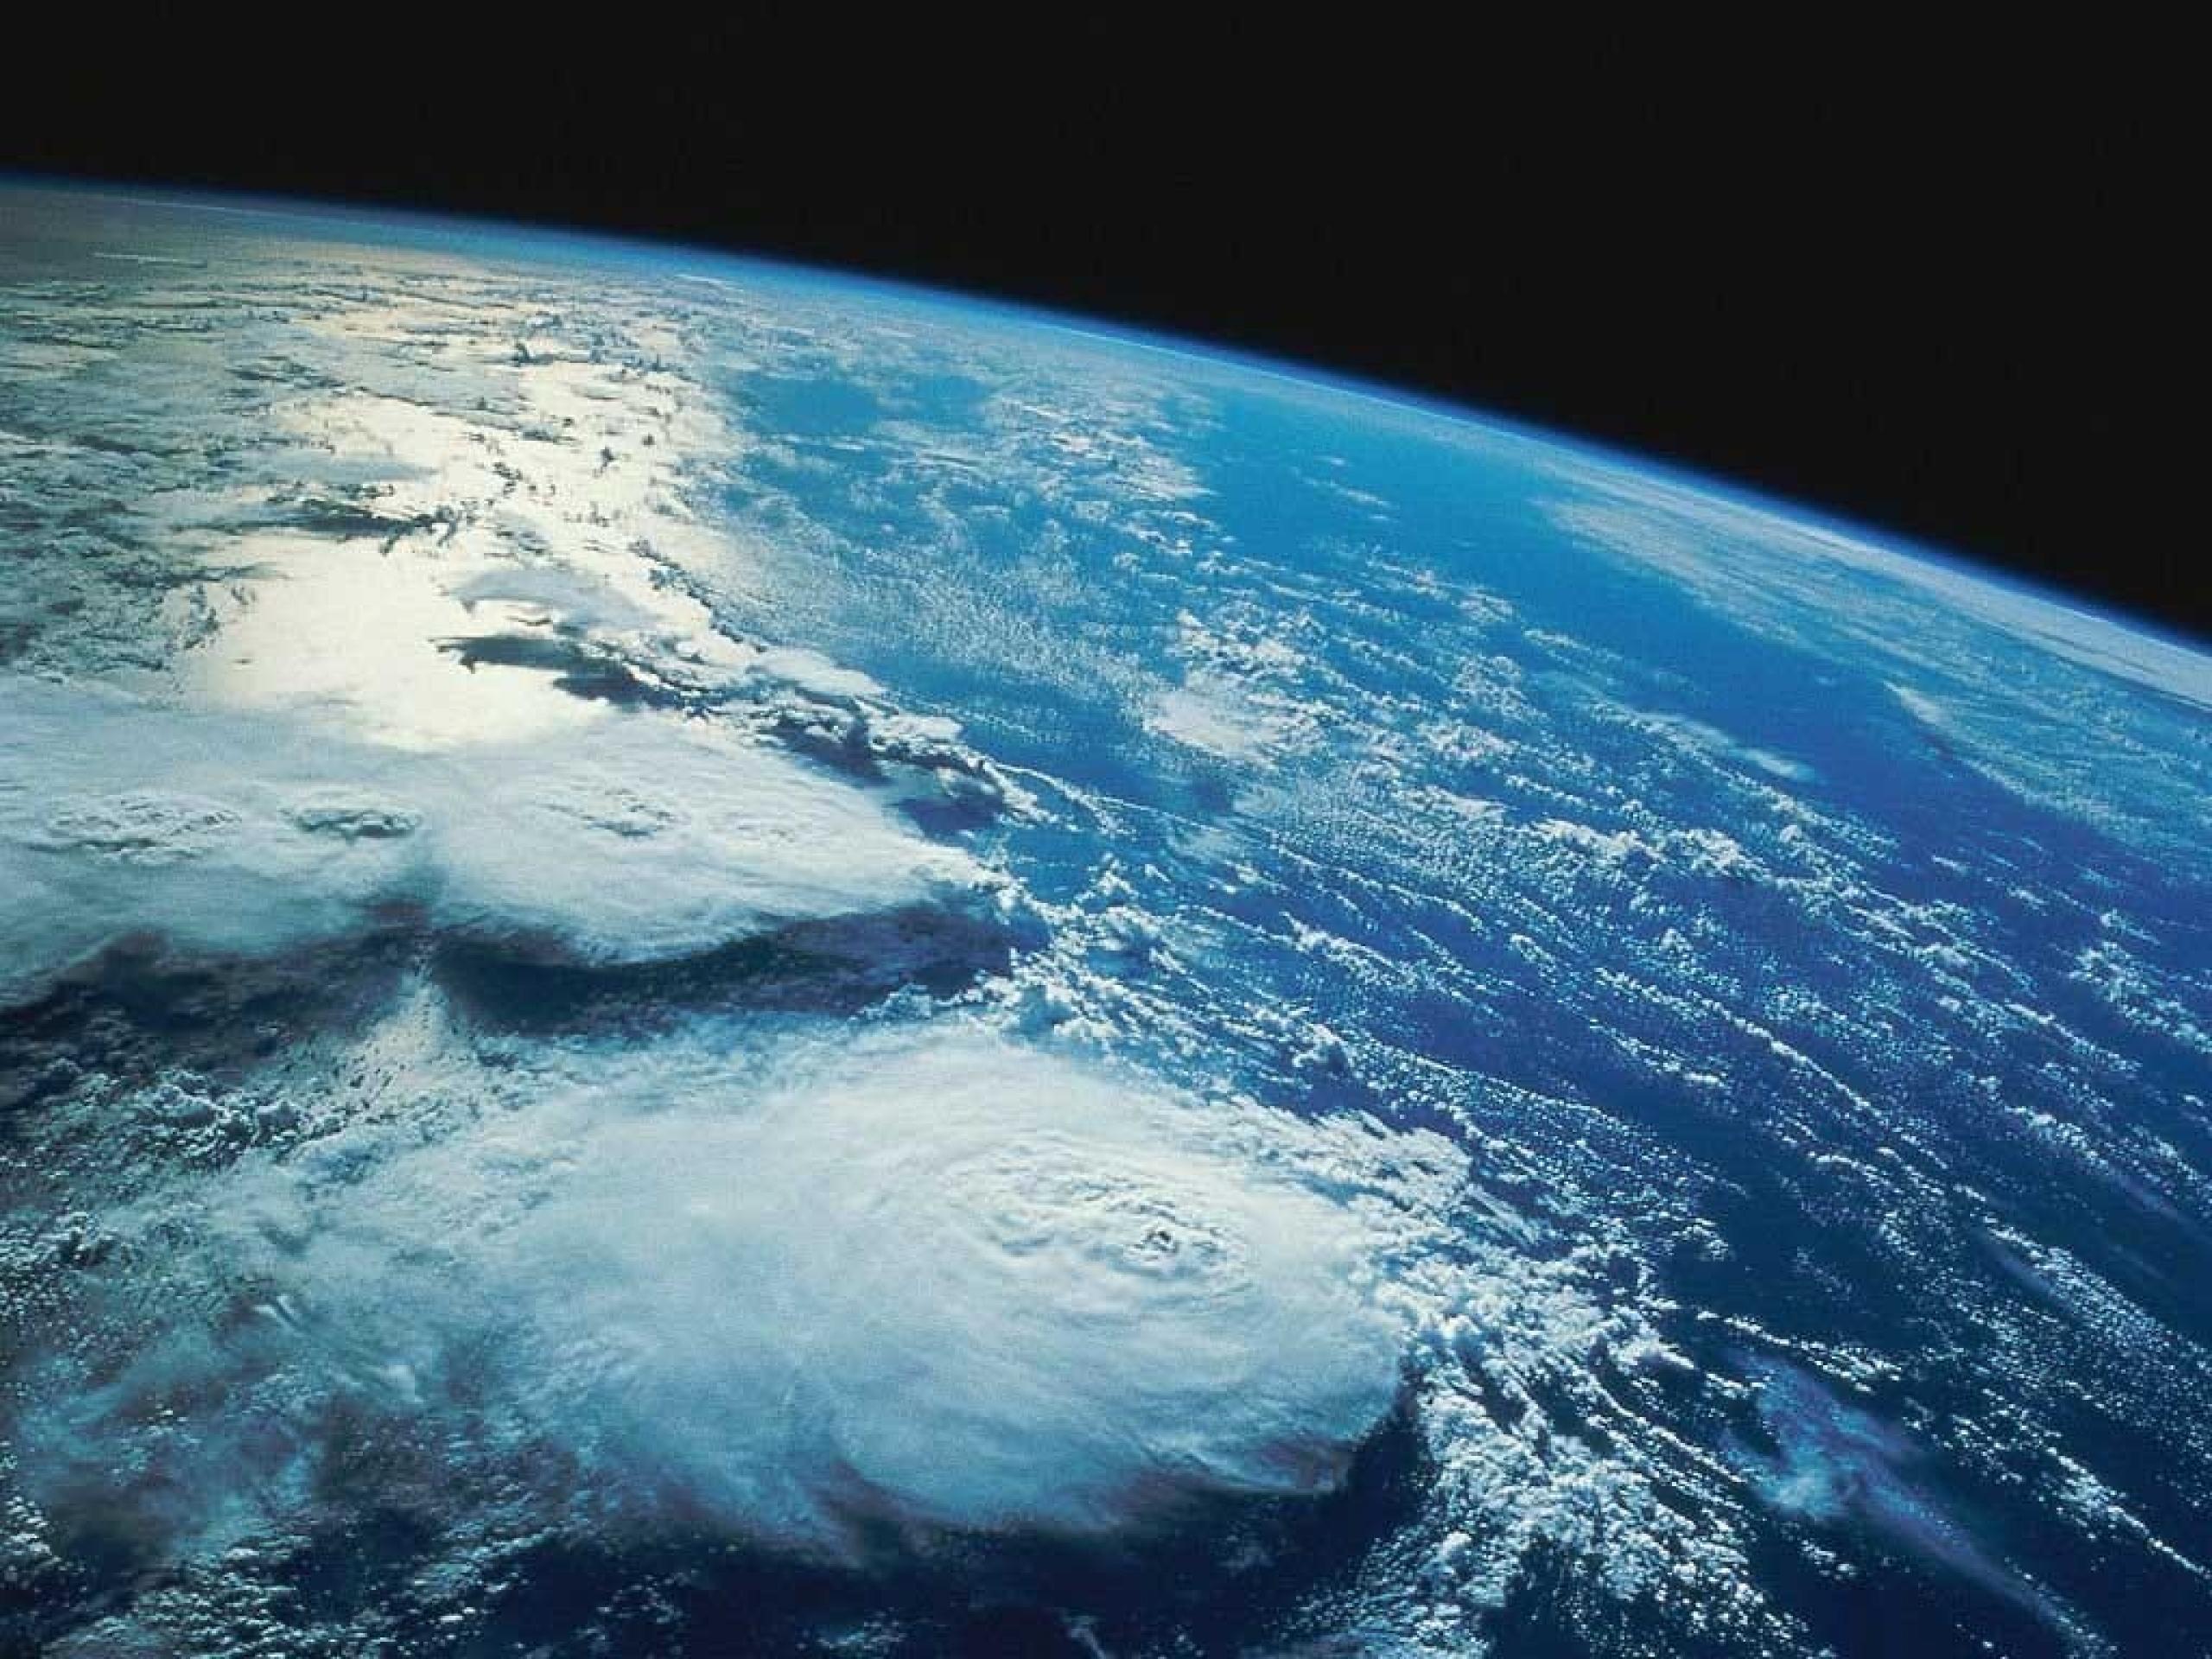 LISTA: Veja os principais recordes do Planeta Terra